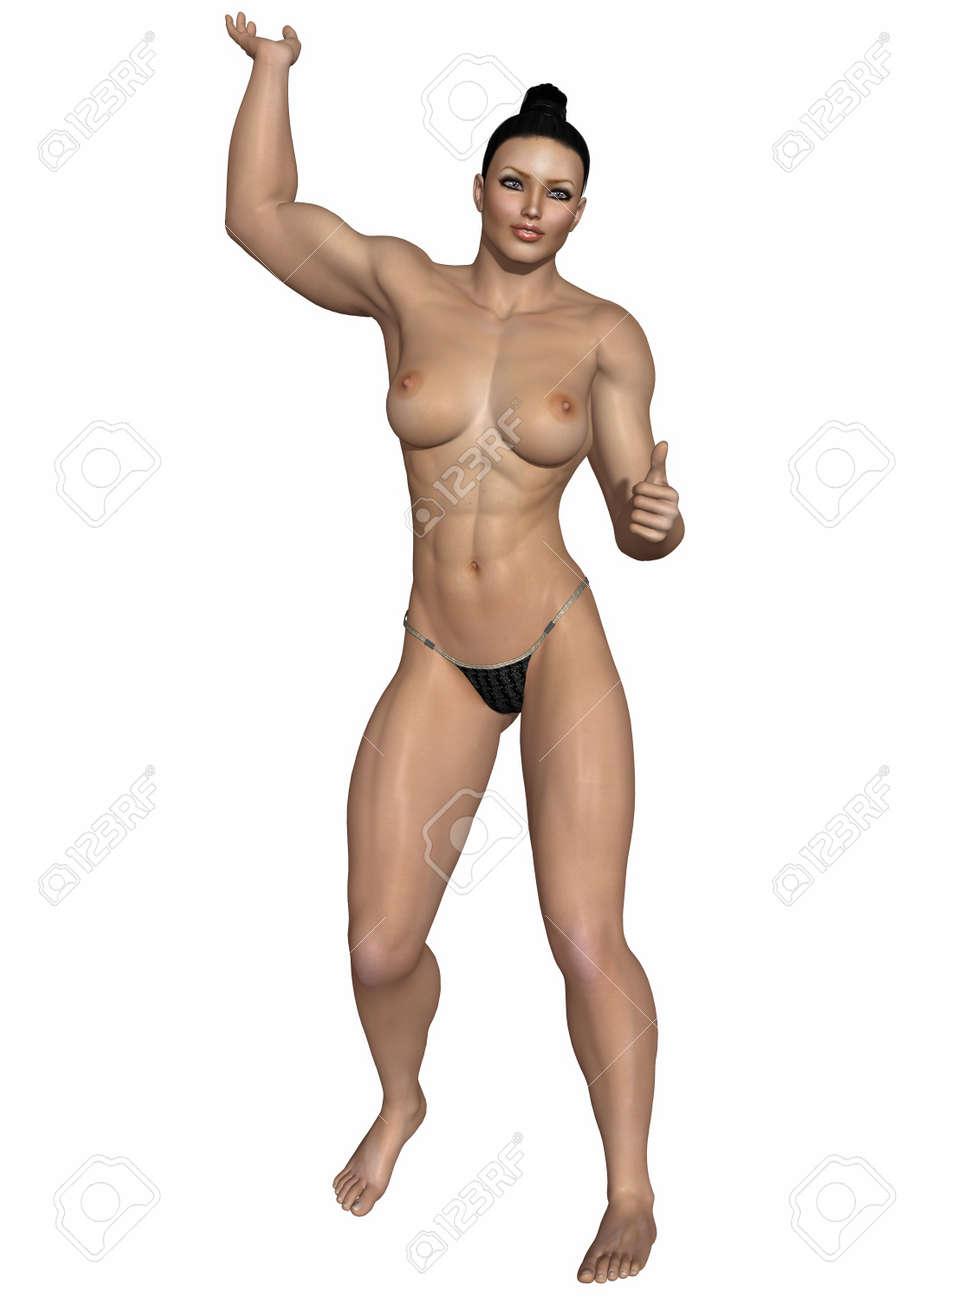 Kylee reese naked sex